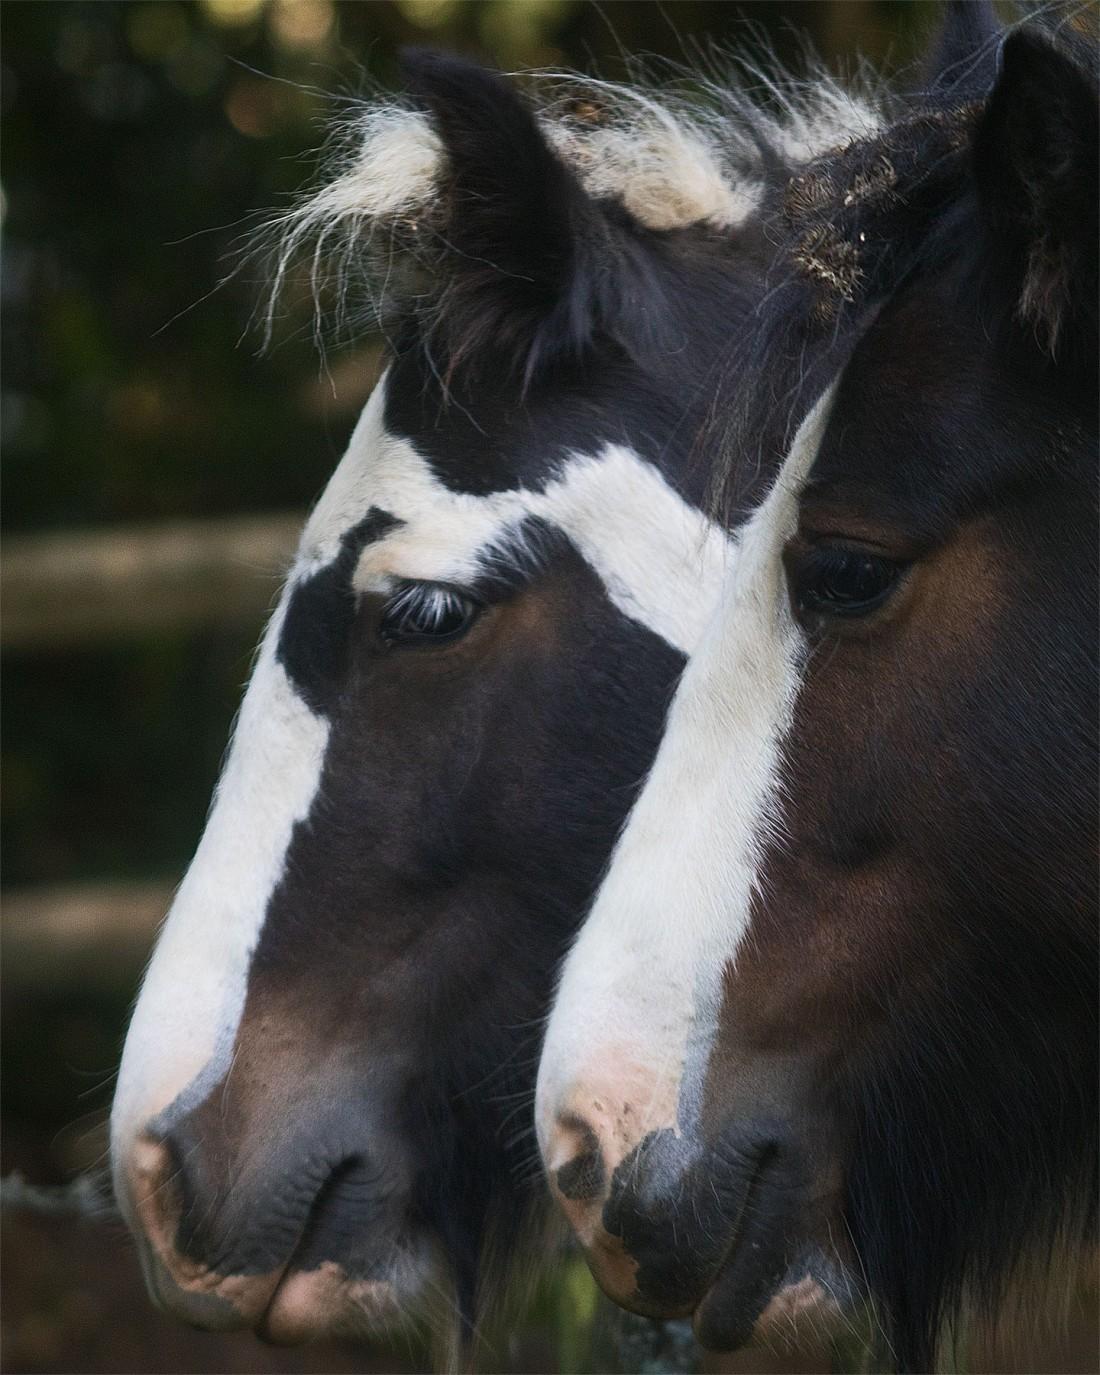 Horses2 24 Sept 2017